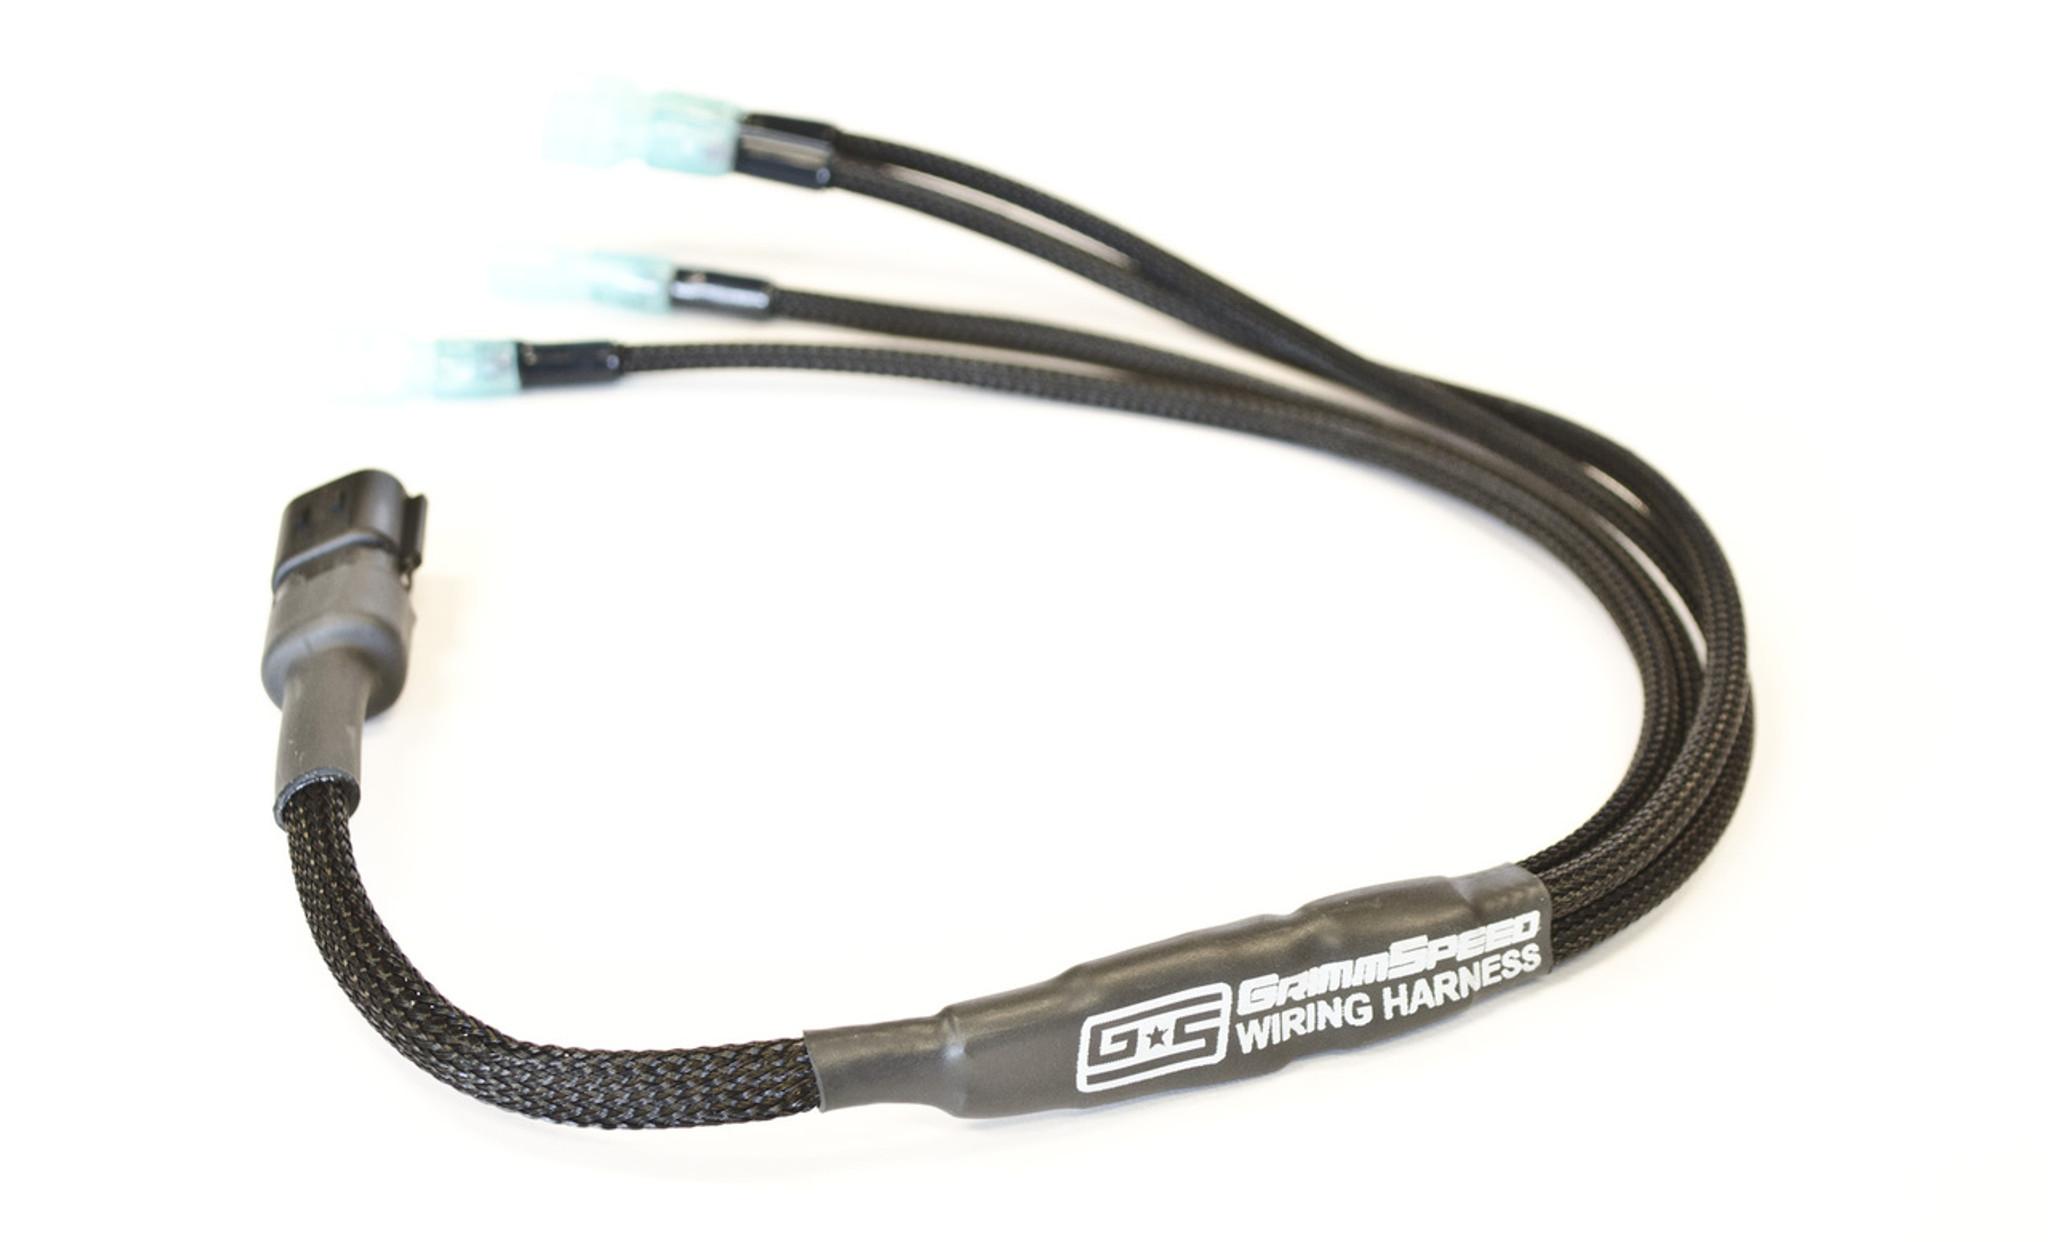 facebook_teaser__76044.1439821622?c=2 grimmspeed hella horn wiring harness 02 14 wrx, 04 14 sti grimmspeed 2013 subaru impreza trailer wiring harness at soozxer.org